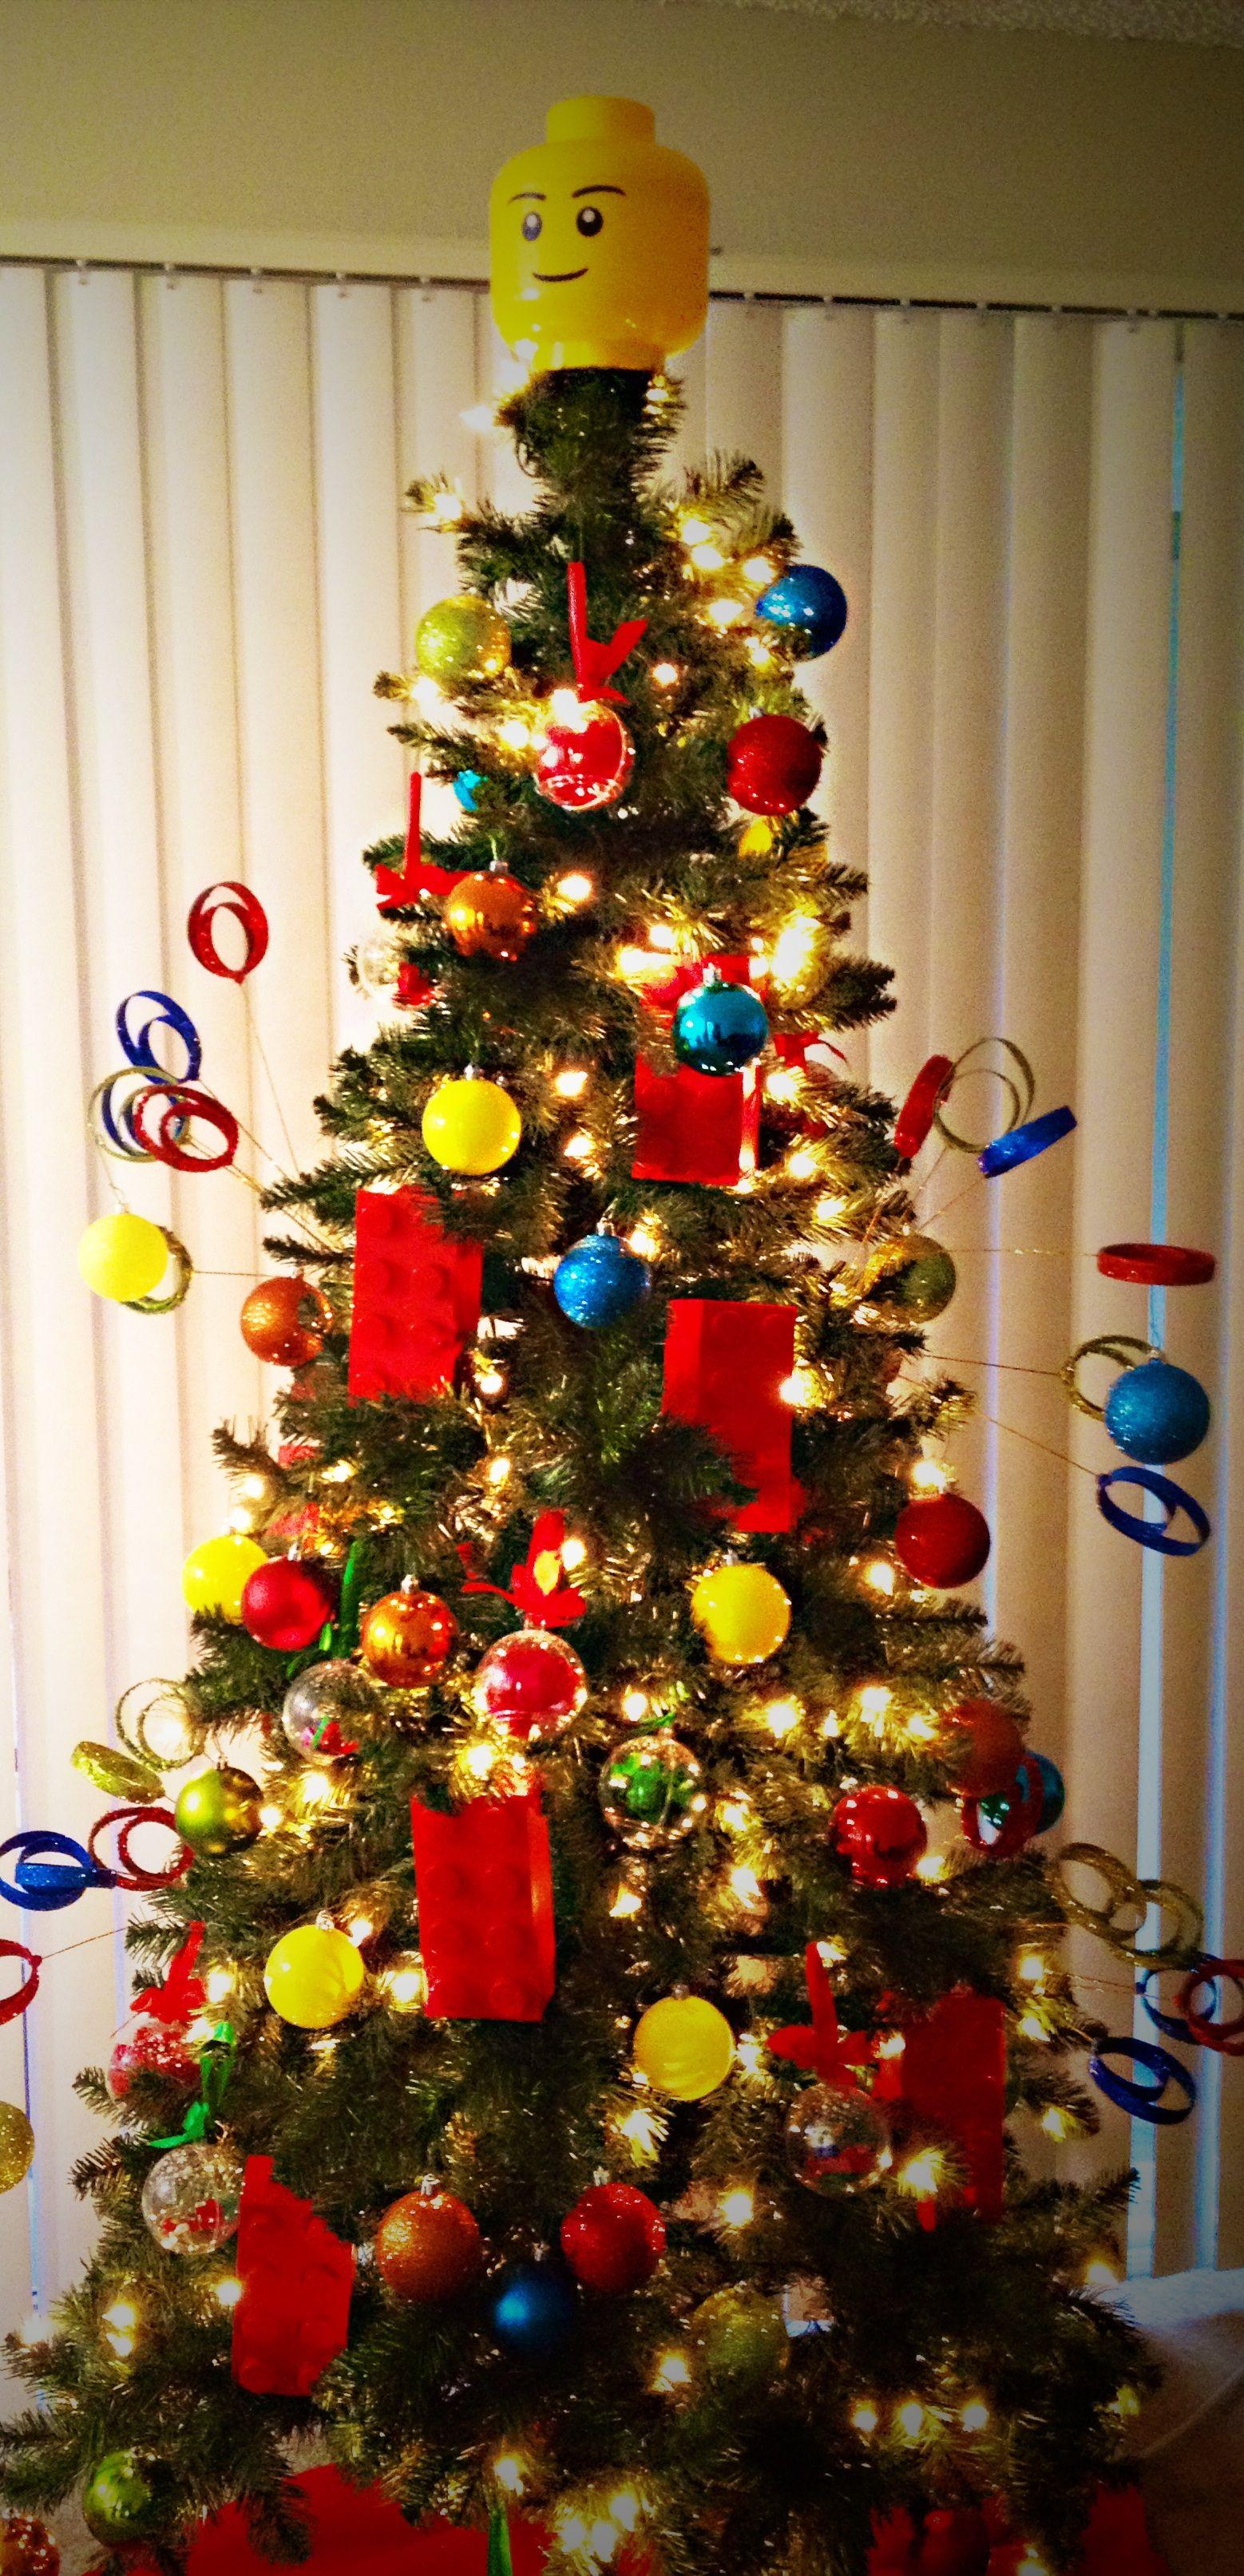 Lego Christmas tree Lego tree Pinterest